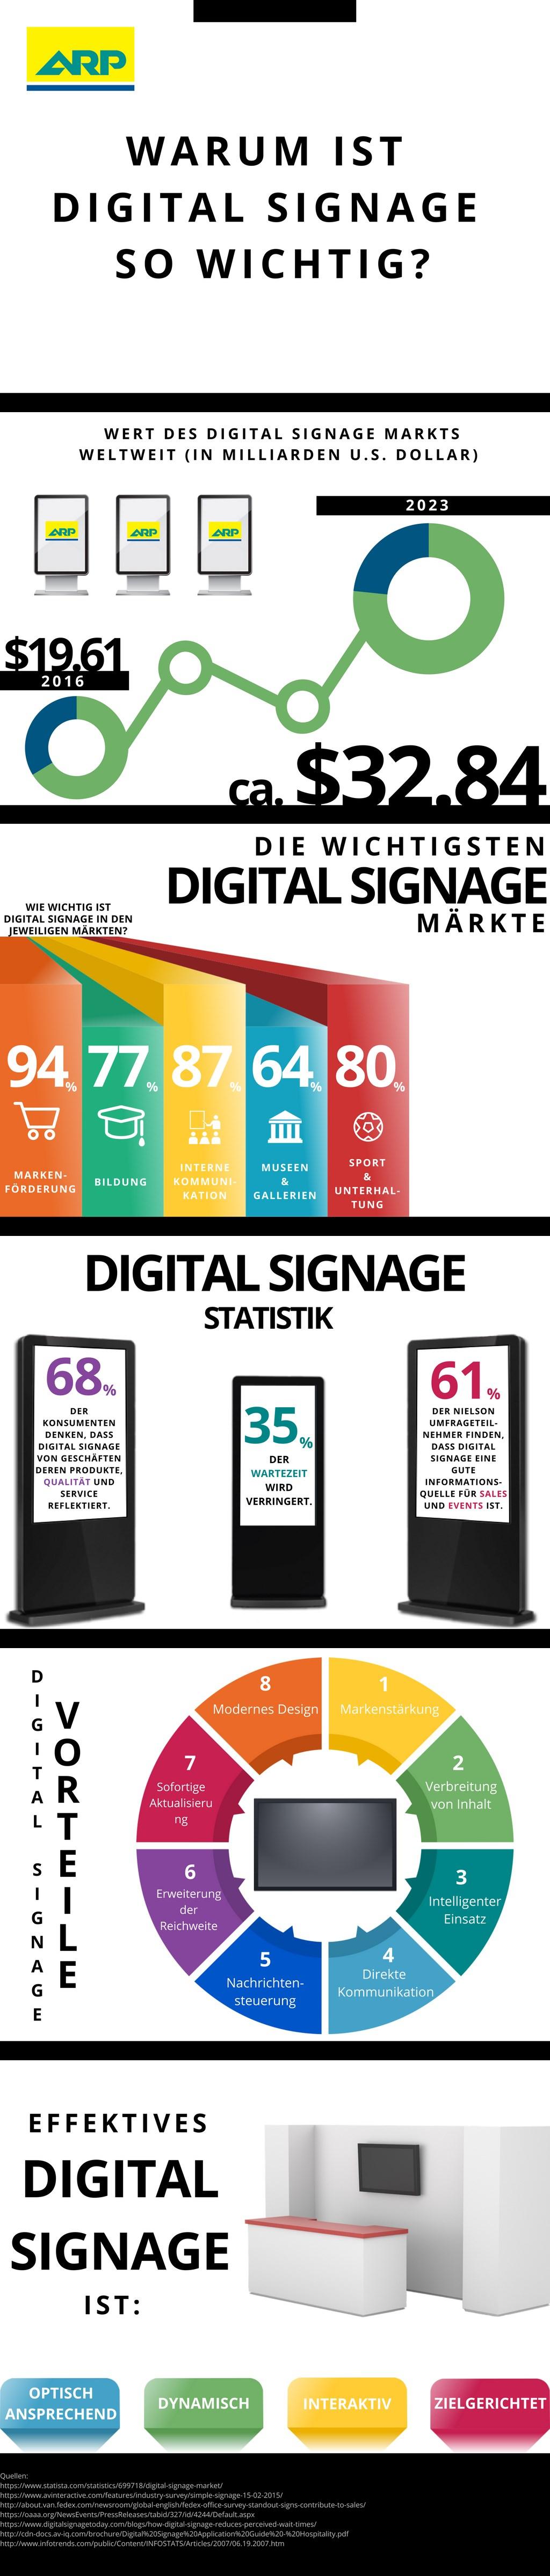 Digital Signage   Electronic Screen & Displays   ARP Schweiz